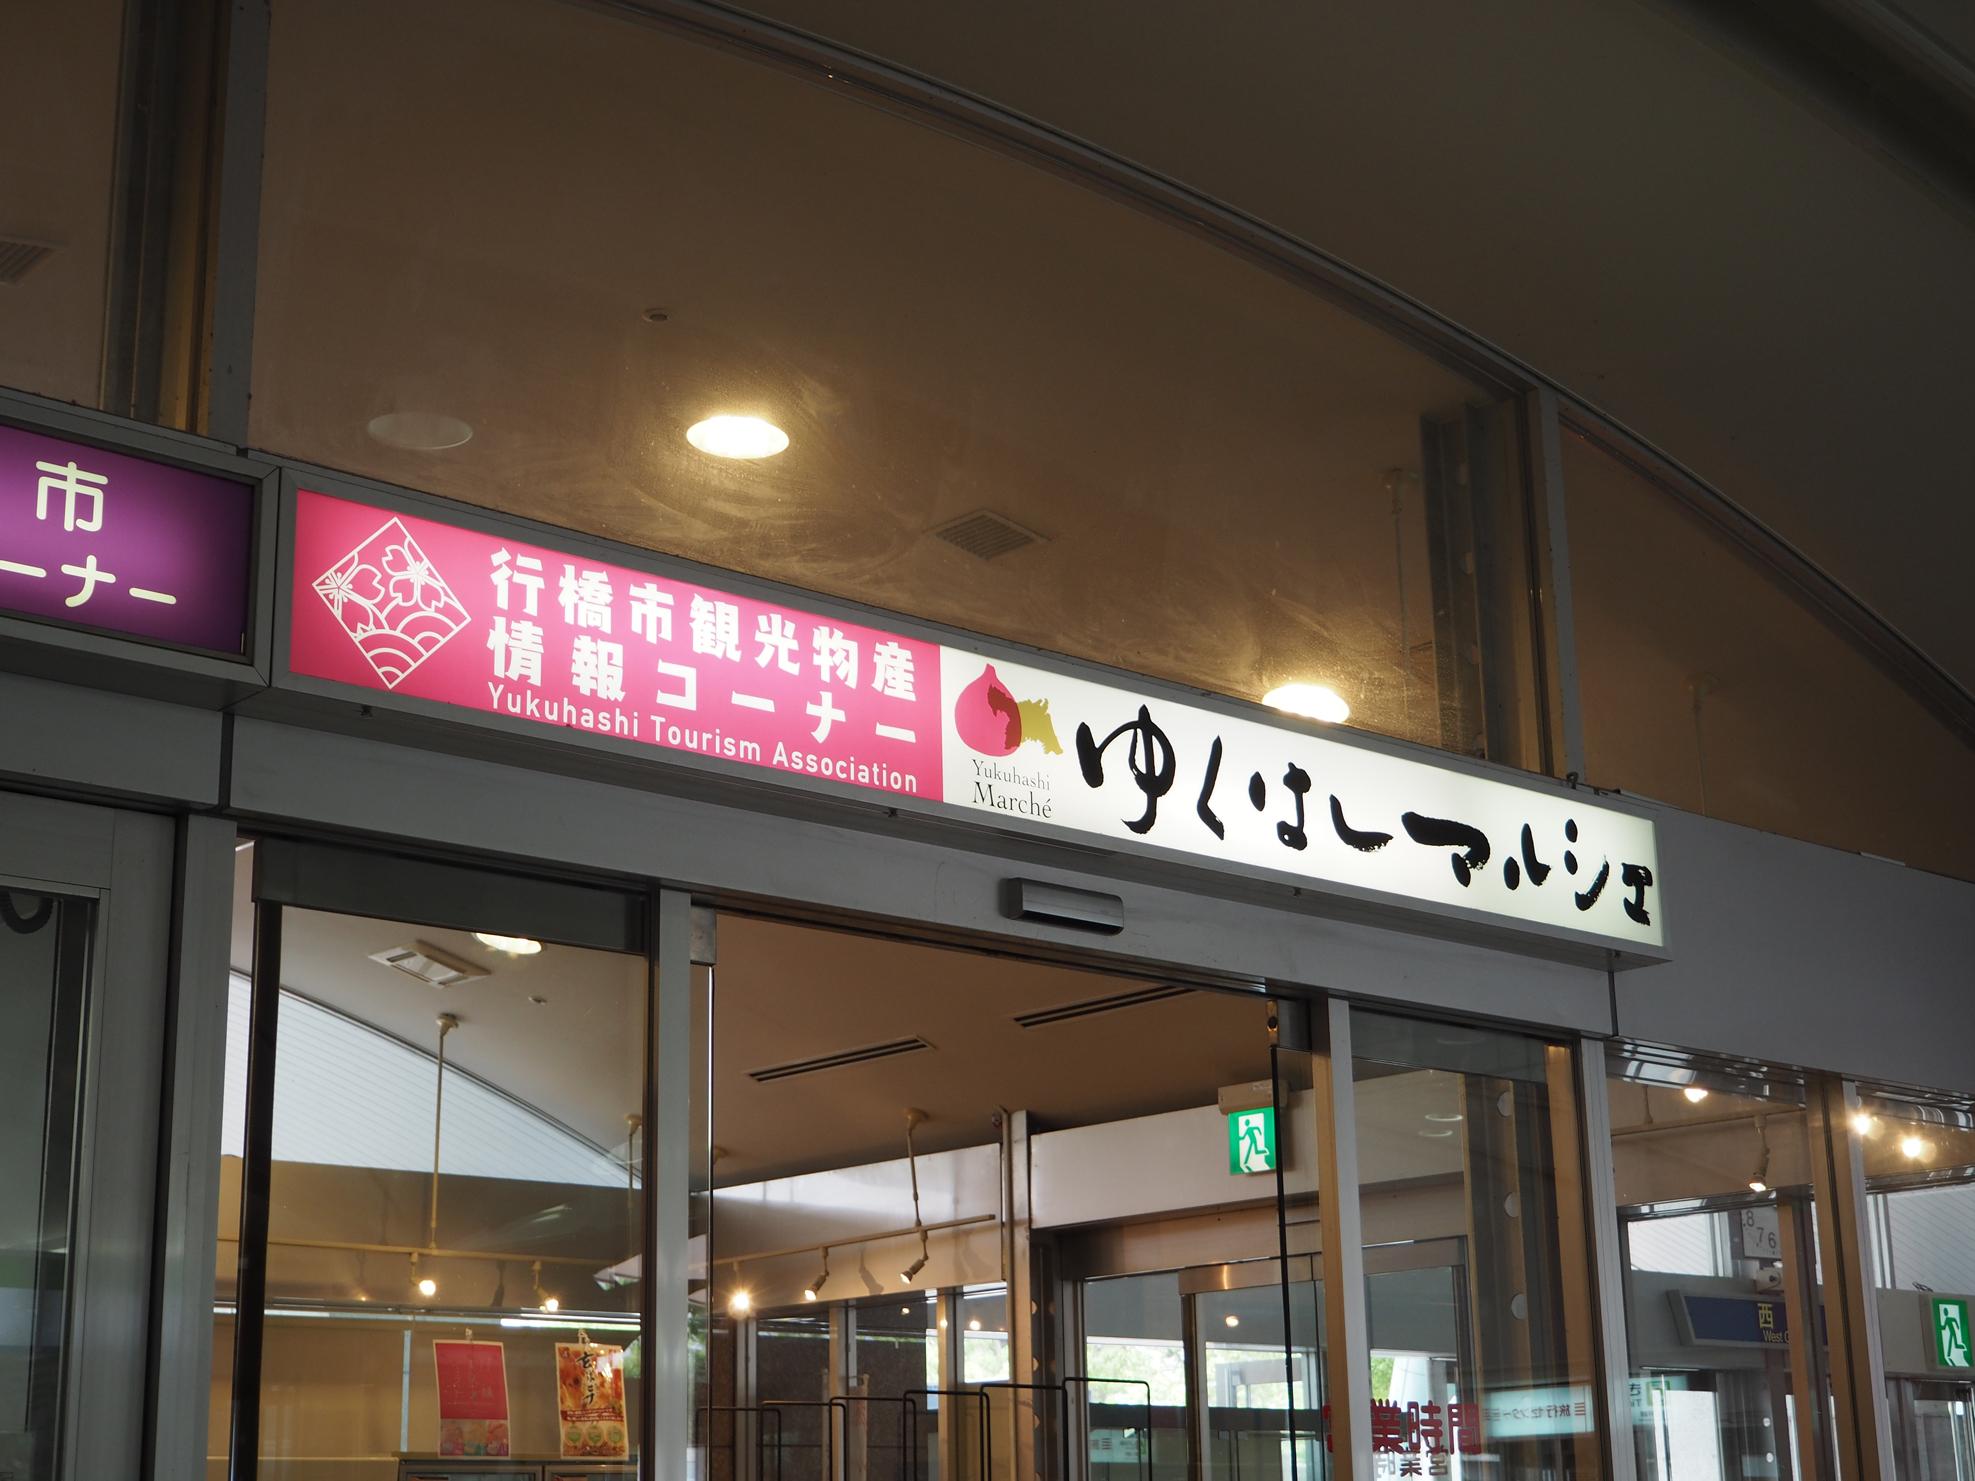 行橋市観光物産情報コーナー